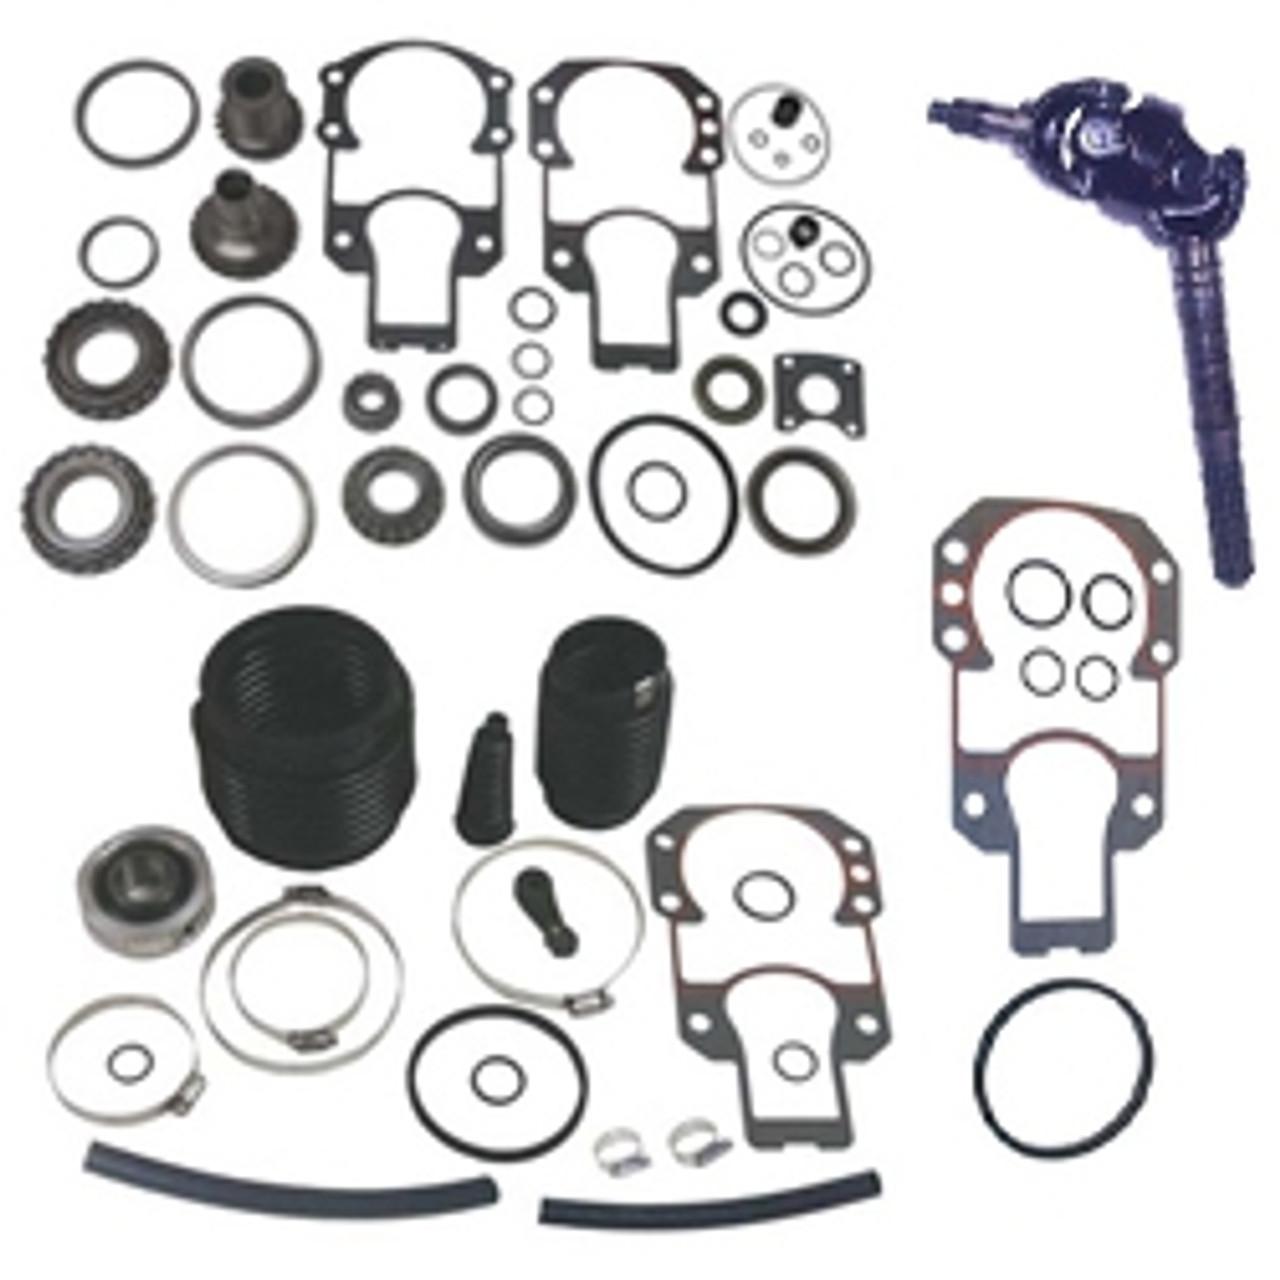 Mercruiser Parts | Wholesale Marine